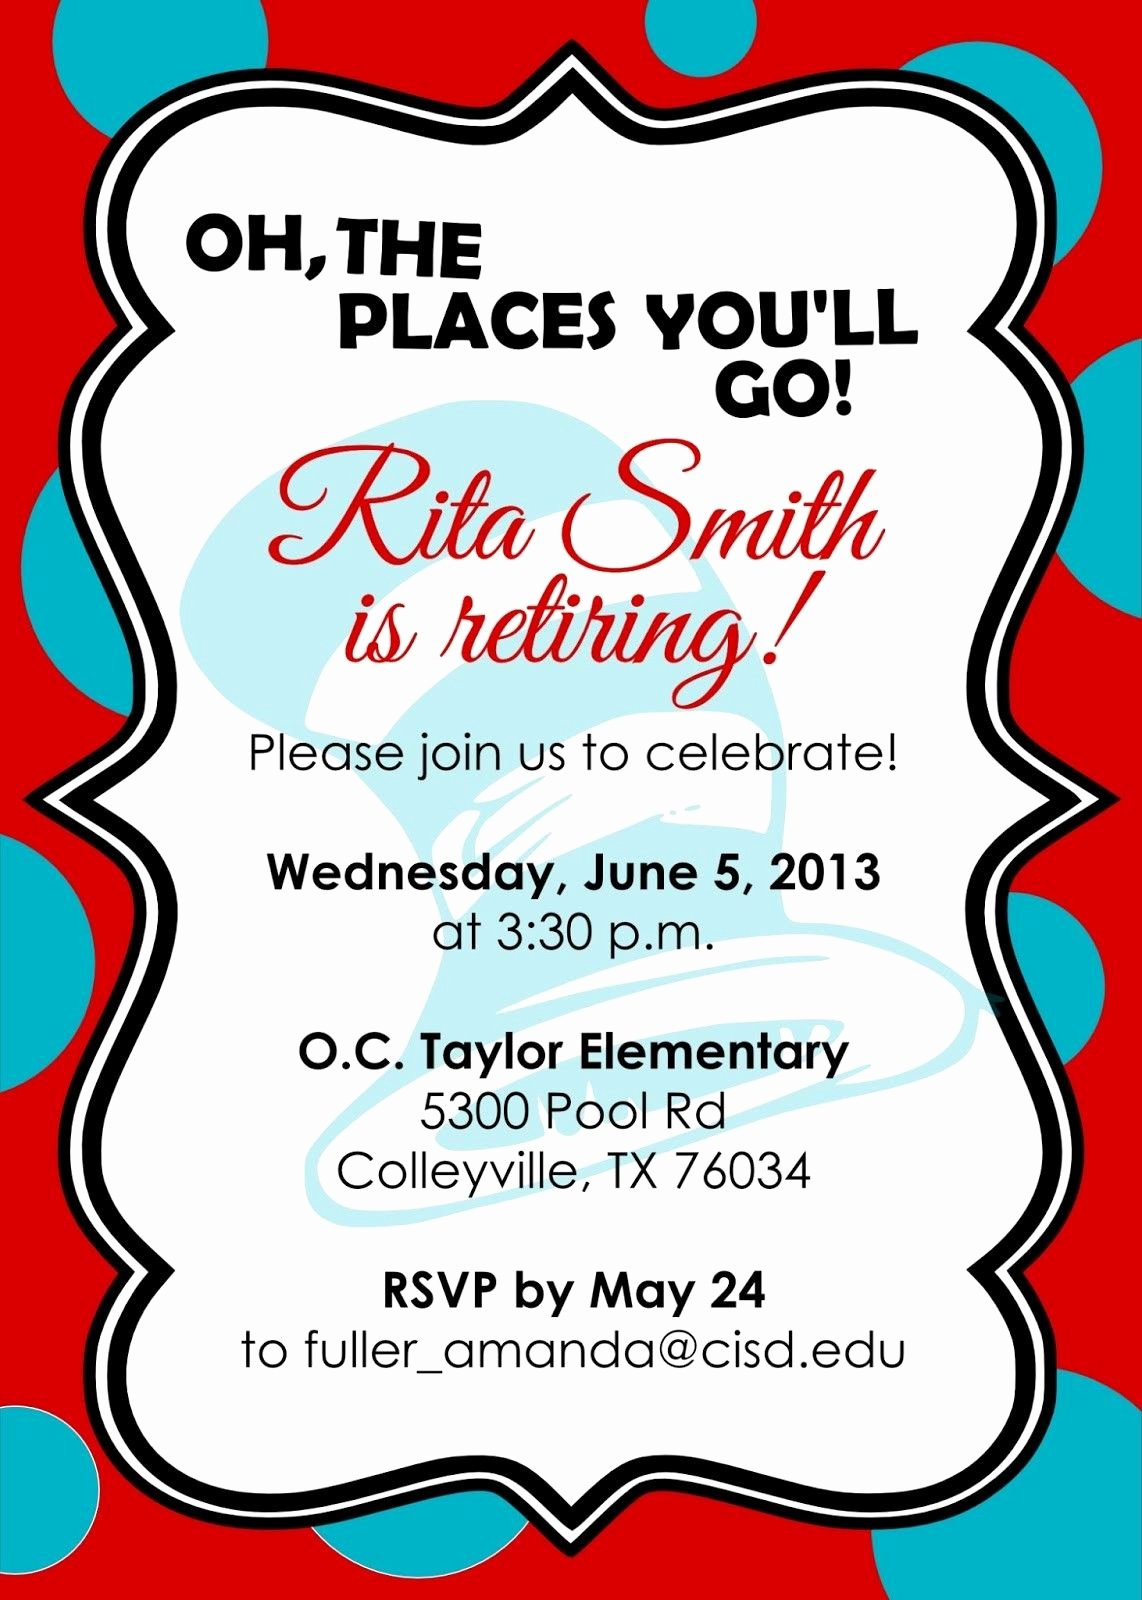 Retirement Party Invitation Templates New Retirement Party Invitations Free Templates